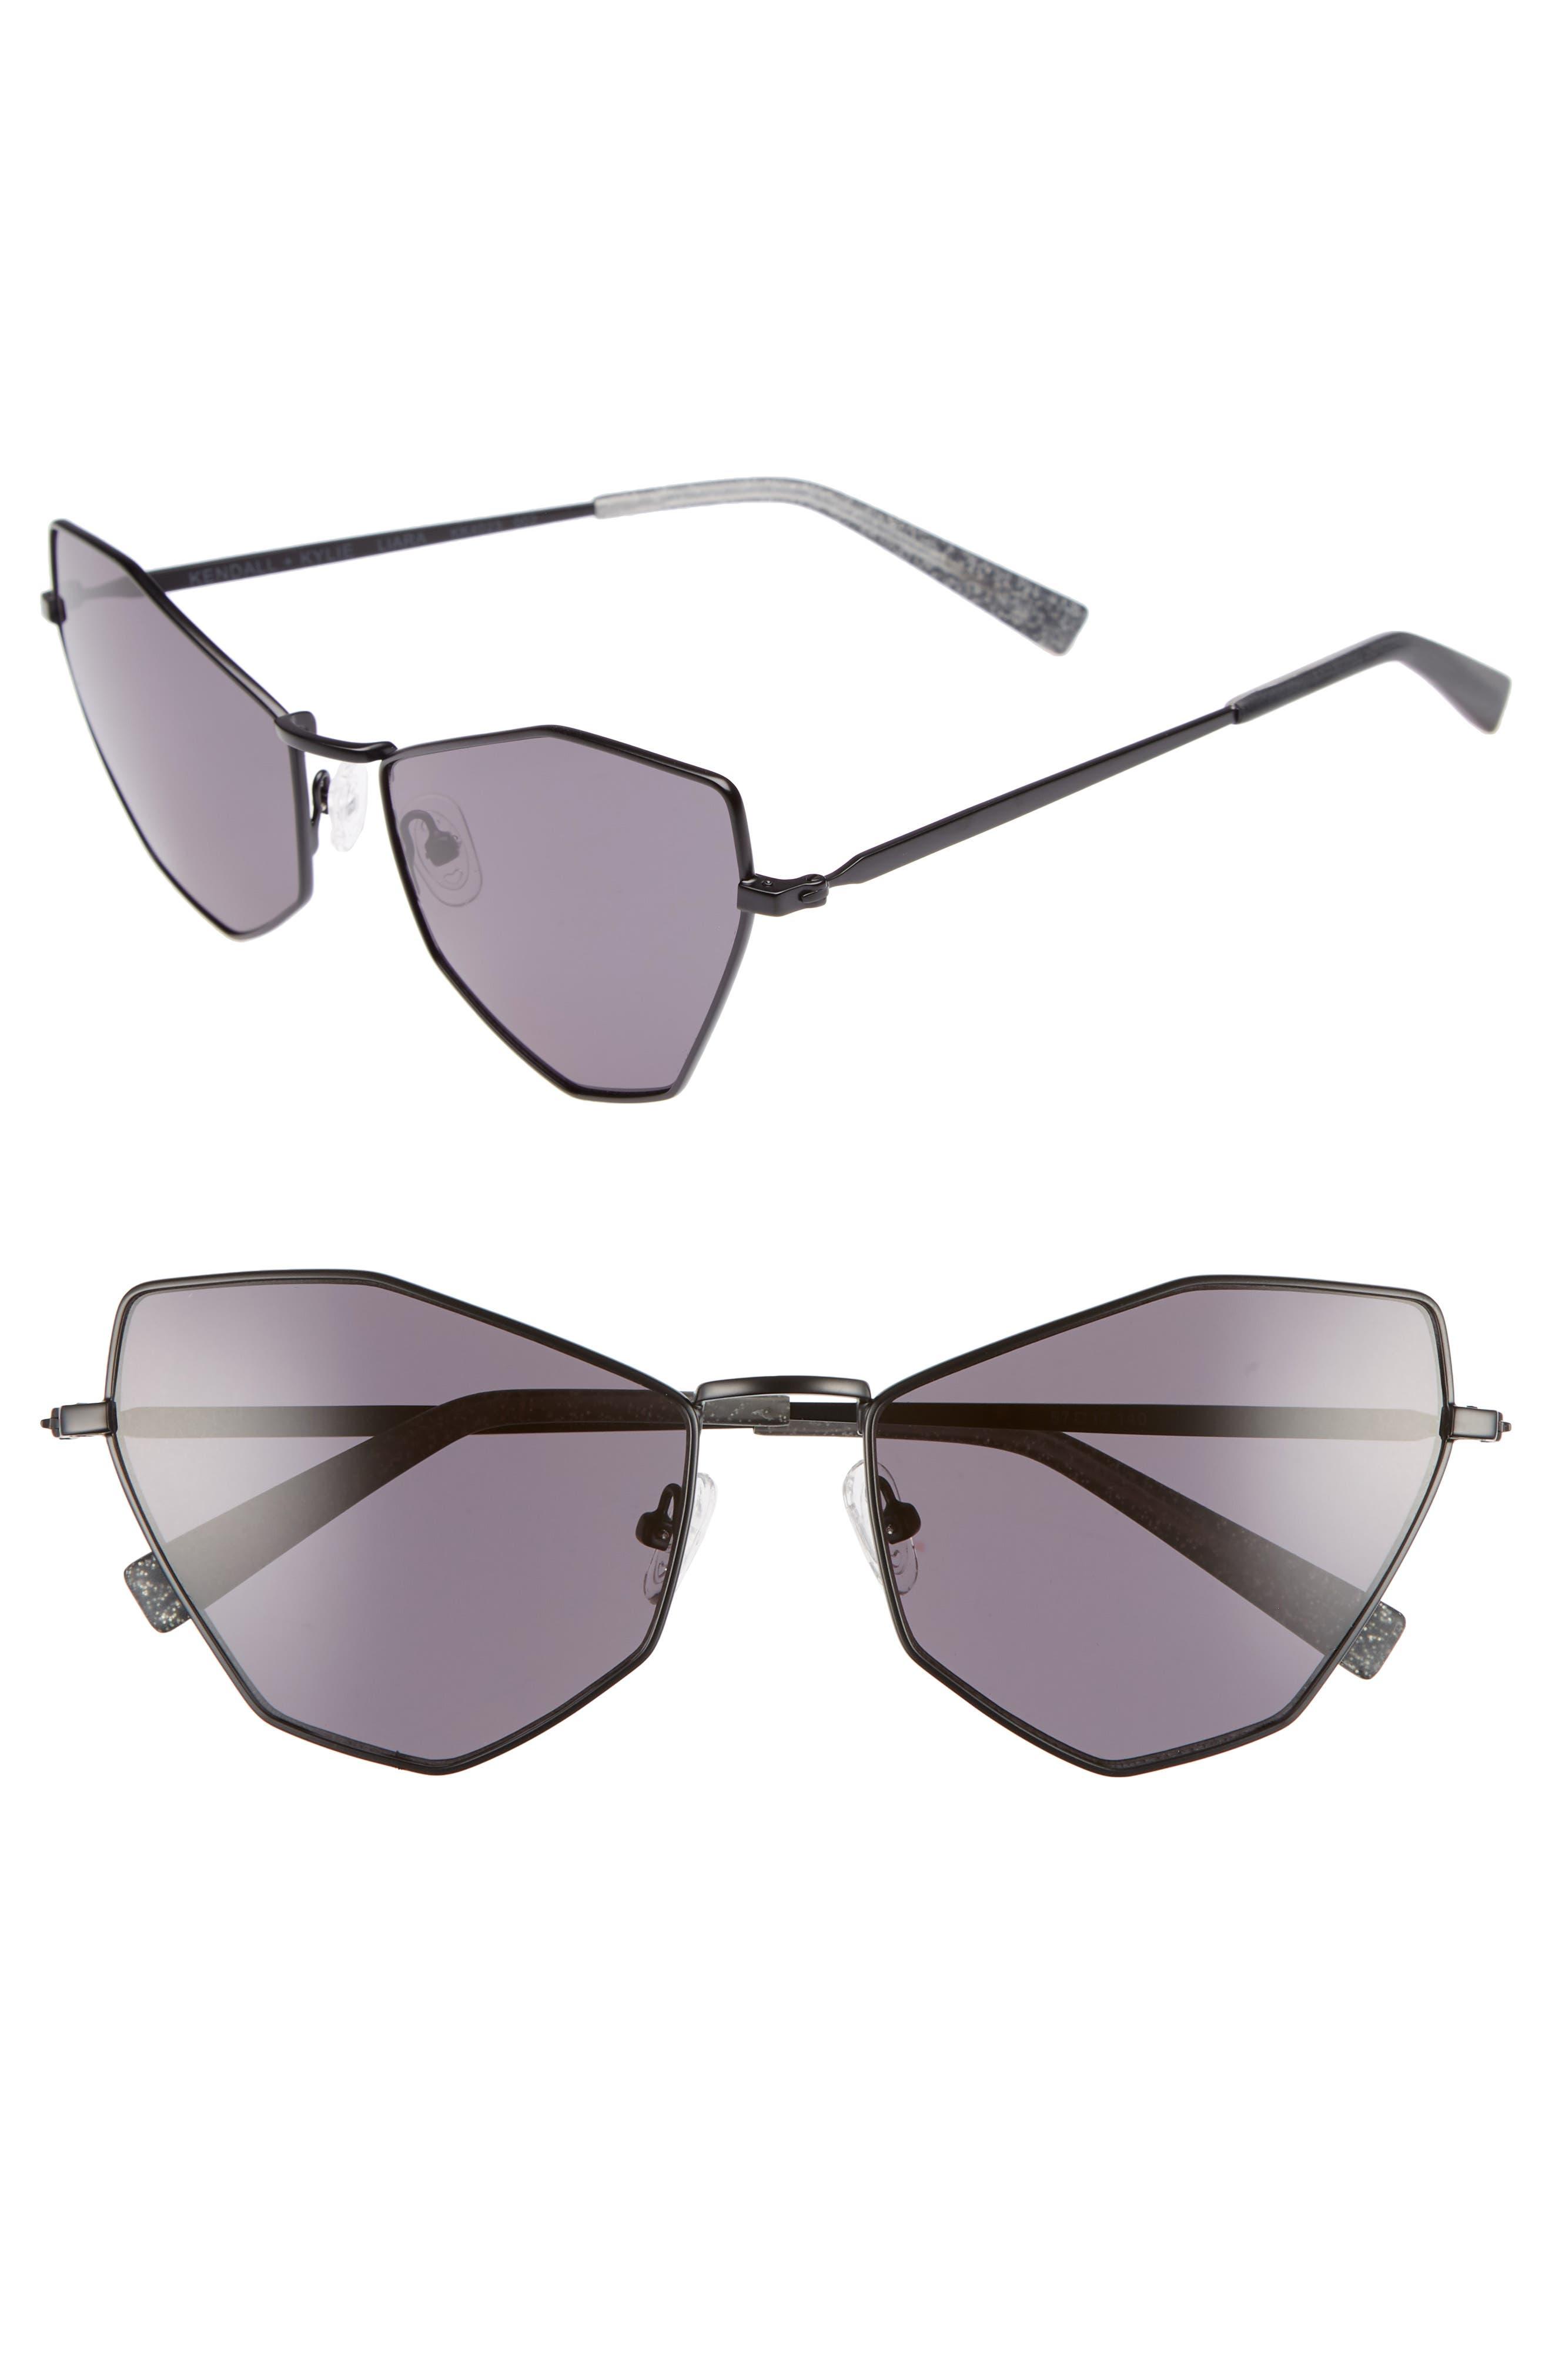 Liara 57mm Cat Eye Sunglasses,                             Main thumbnail 1, color,                             BLACK METAL/ SOLID SMOKE